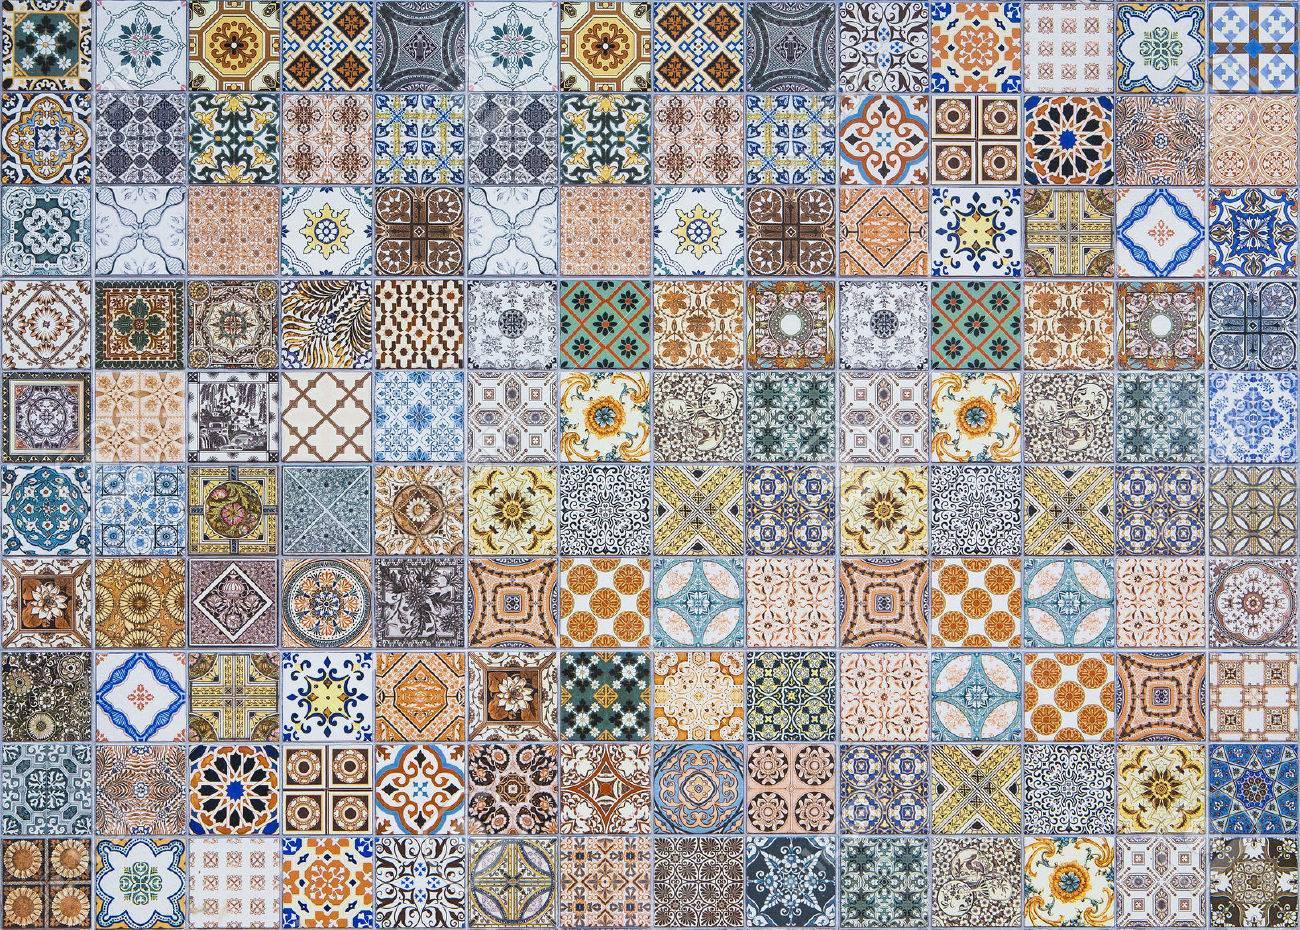 Fliesen: Fliesen Muster Aus Portugal.